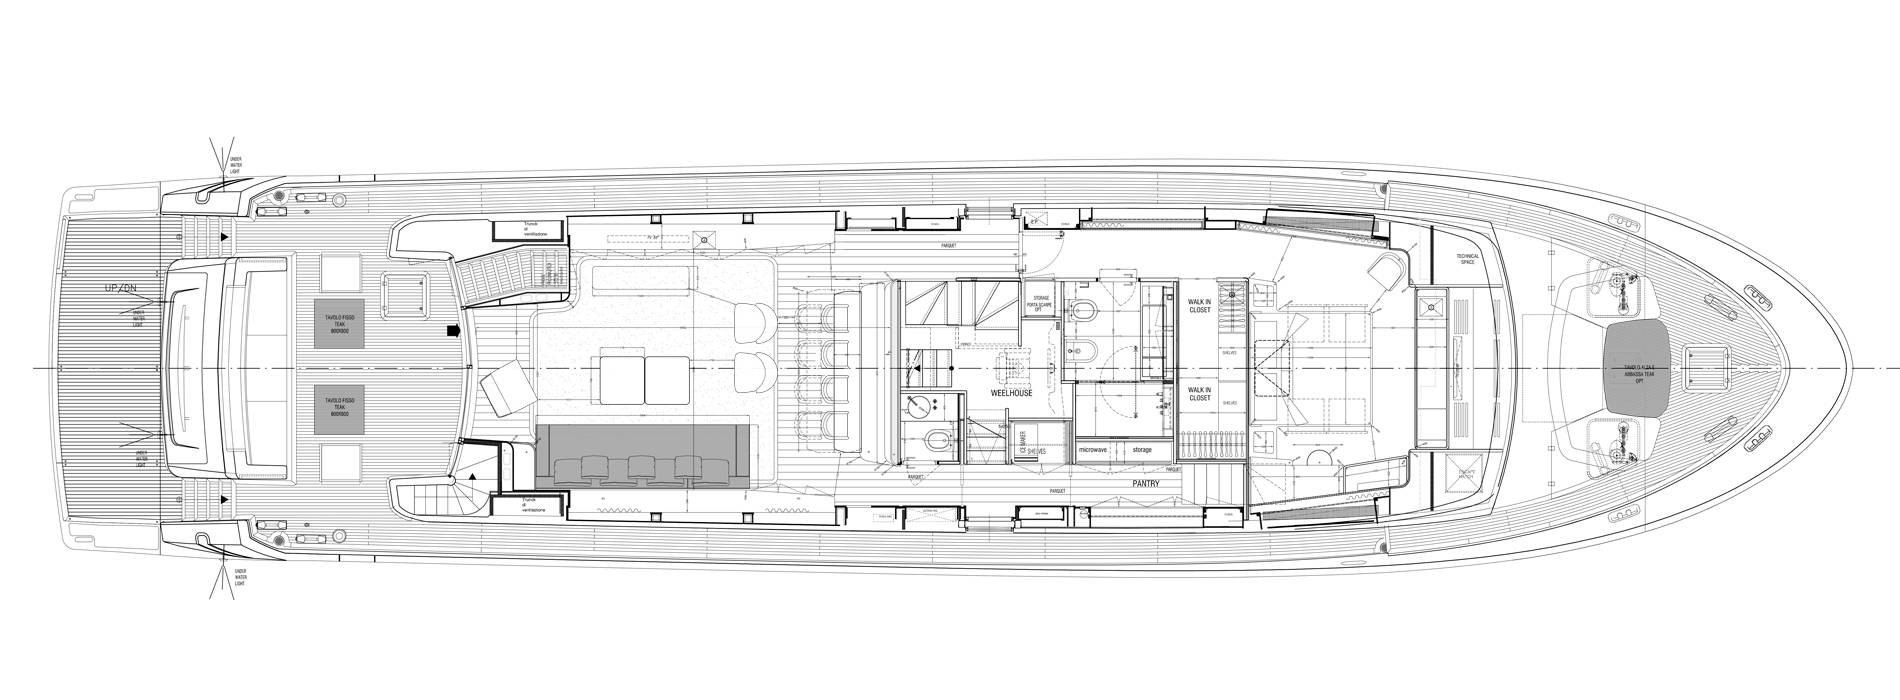 Sanlorenzo Yachts SL96-635 Main deck